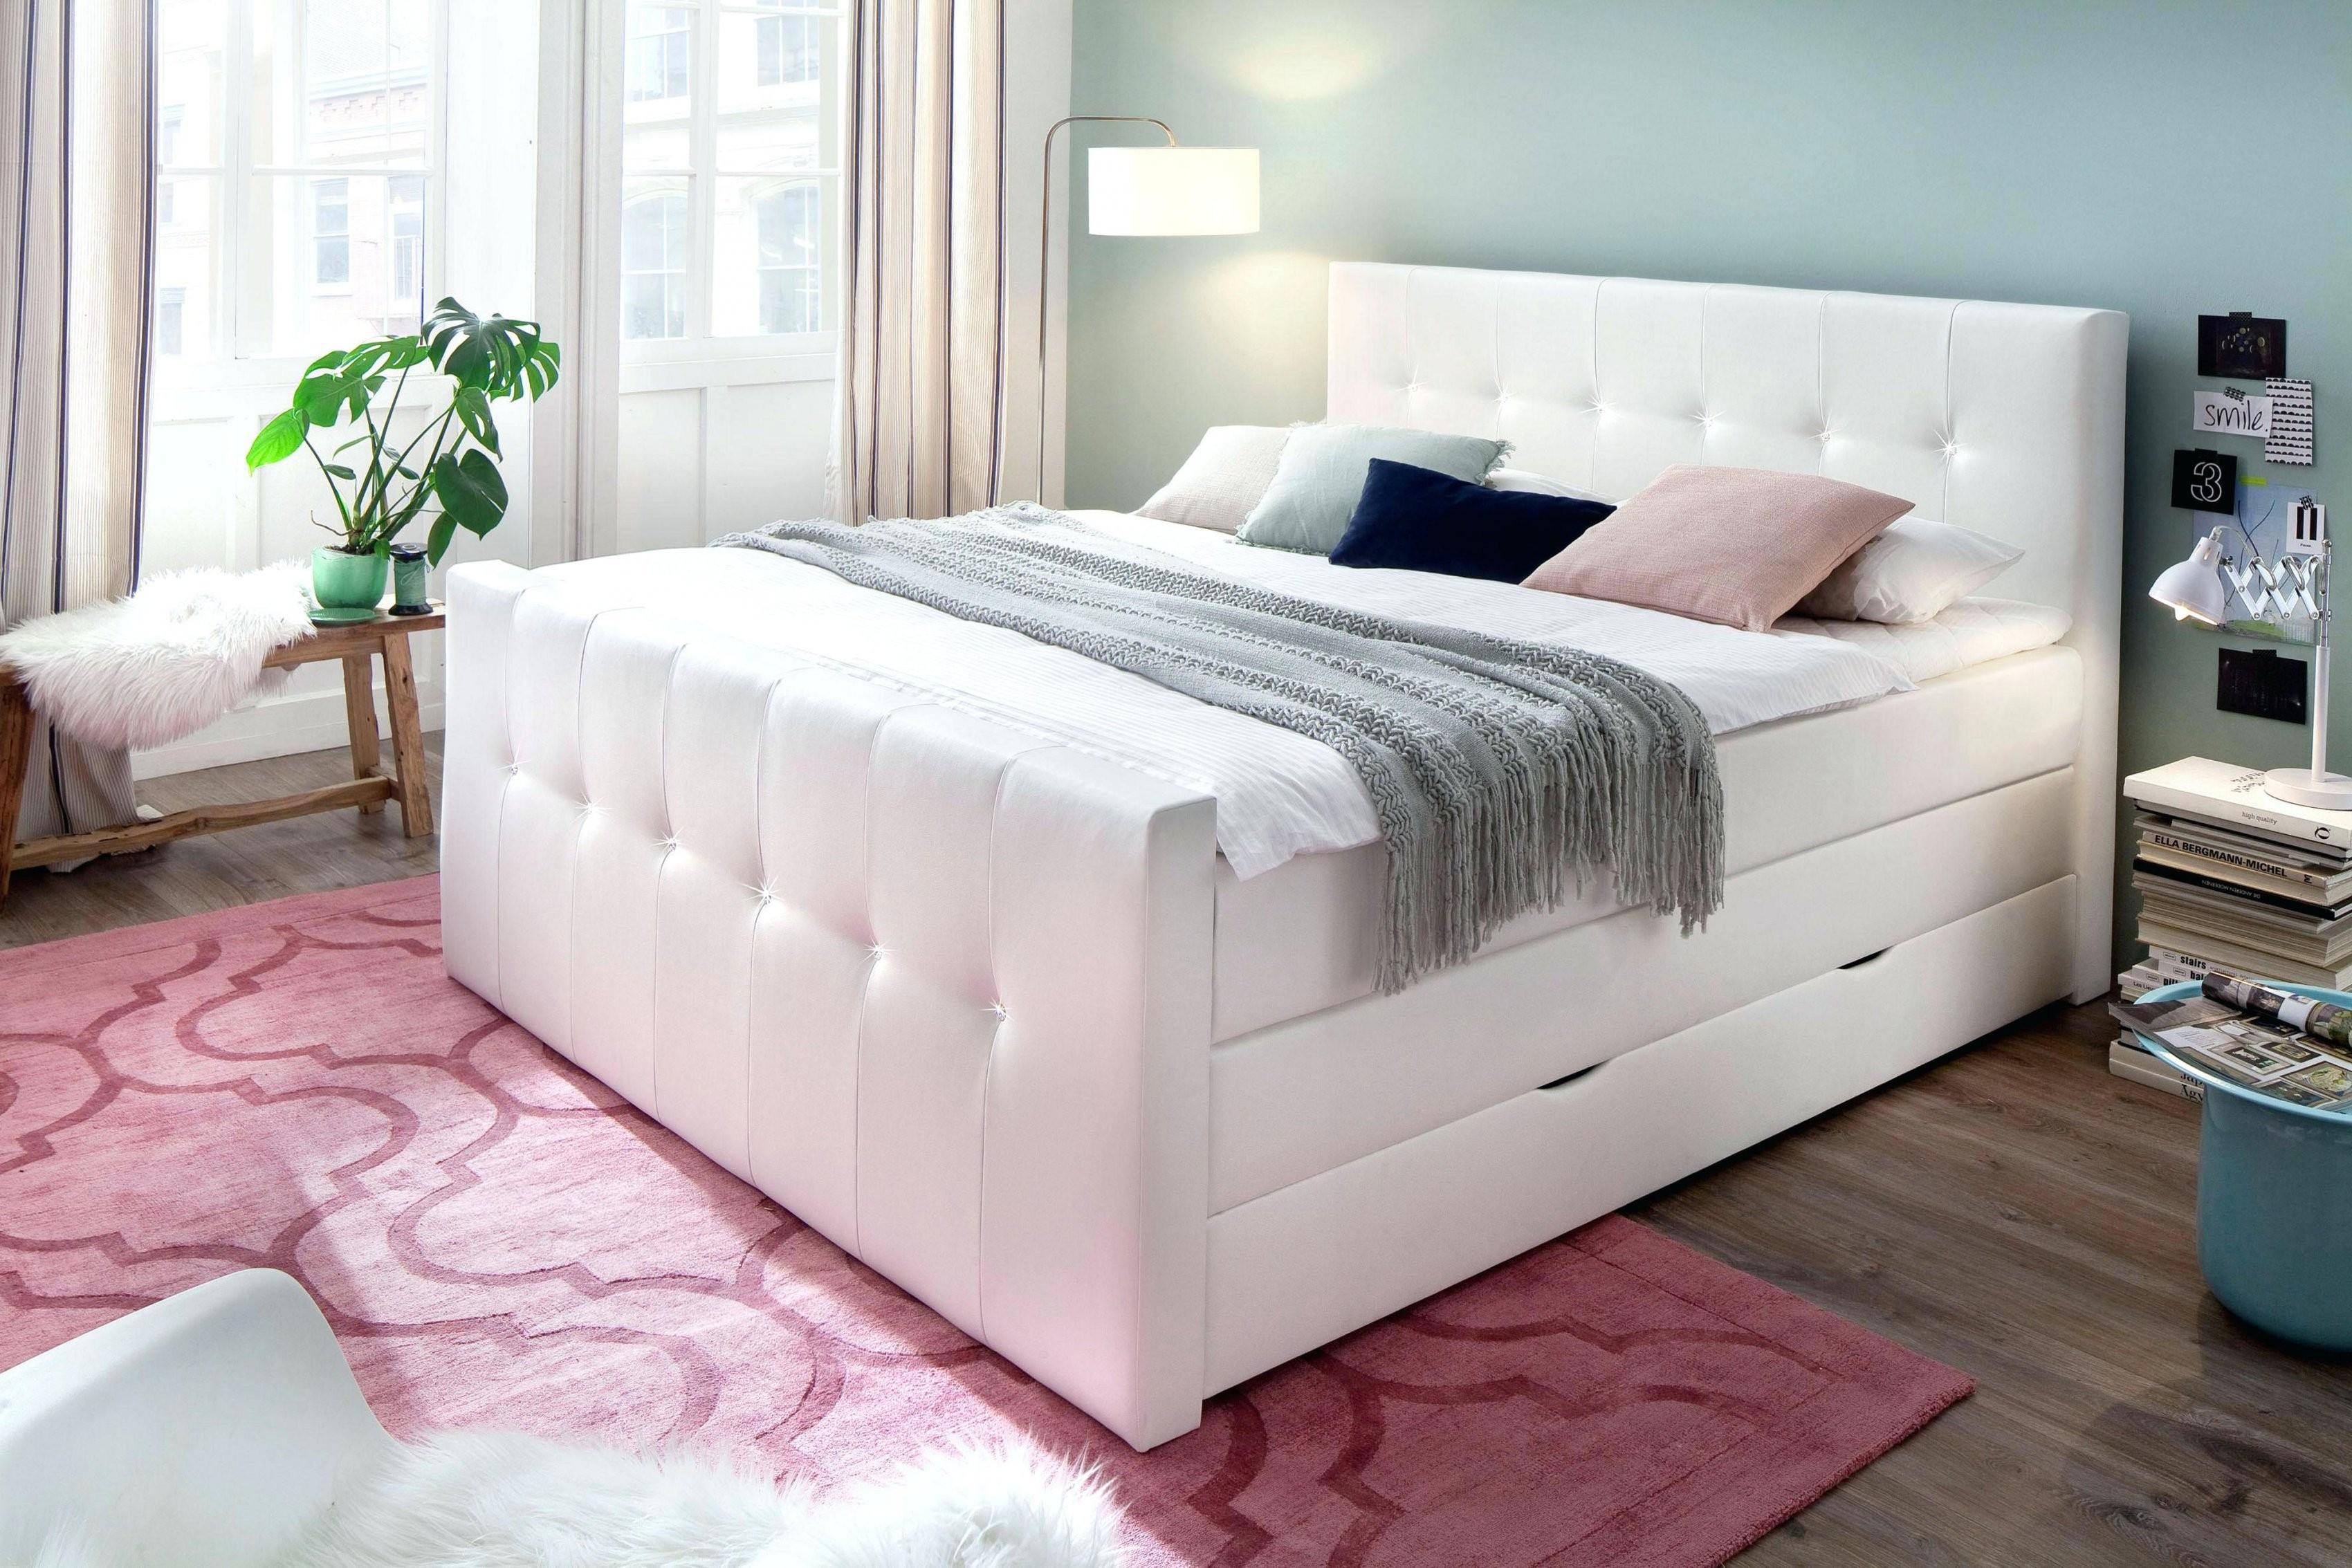 Boxspringbett Mit Bettkasten 180×200 Full Size Of Betten von Boxspringbett 140X200 Baur Bild